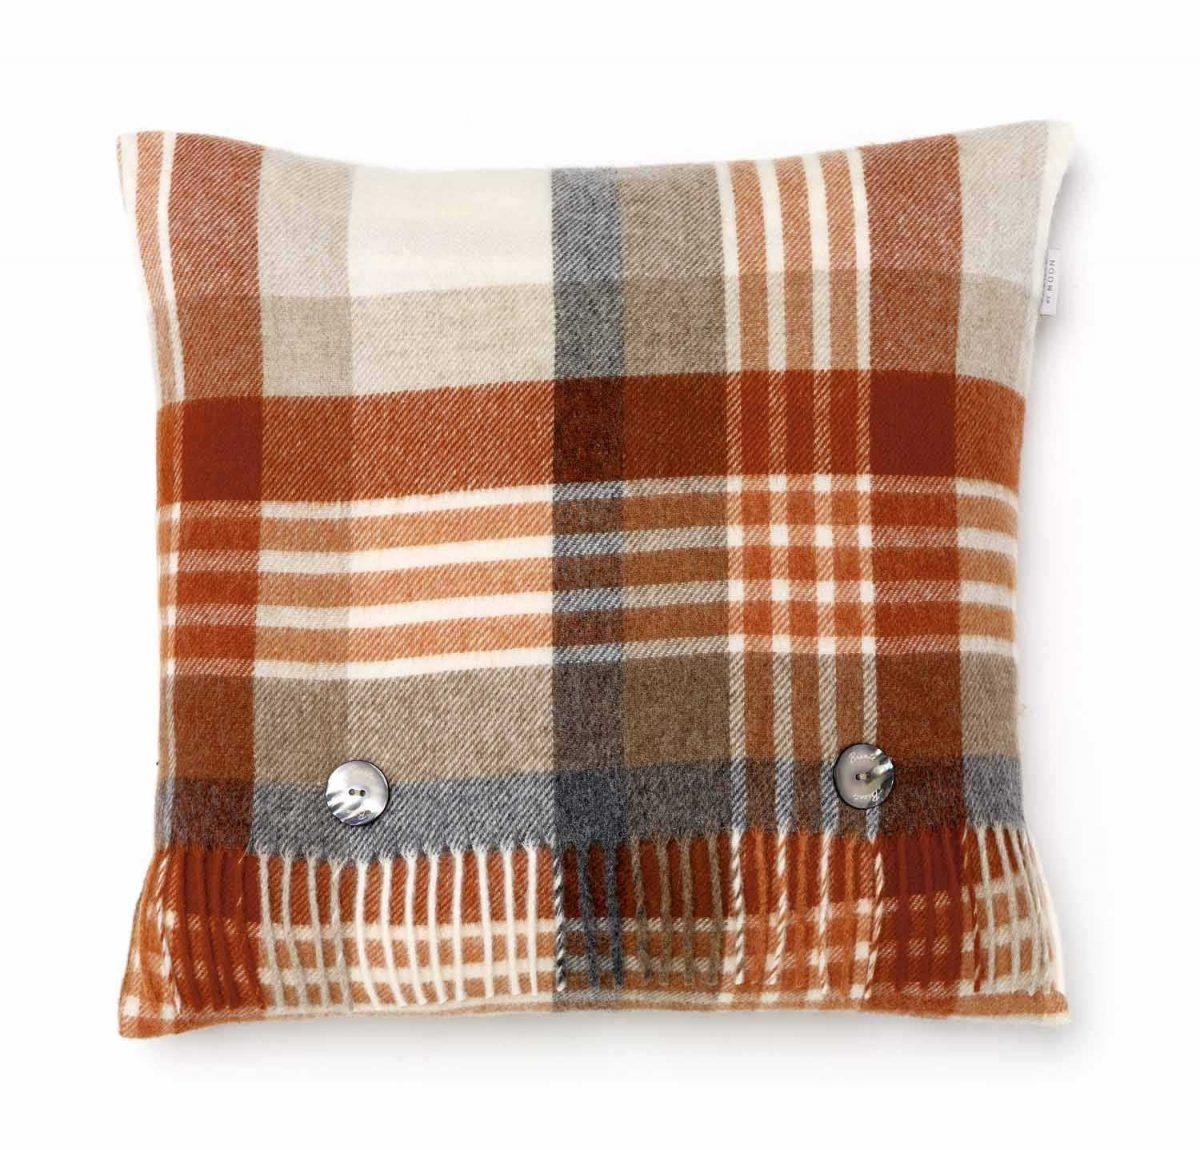 T0359 K06 Lambswool Melburne Saffron Cushion